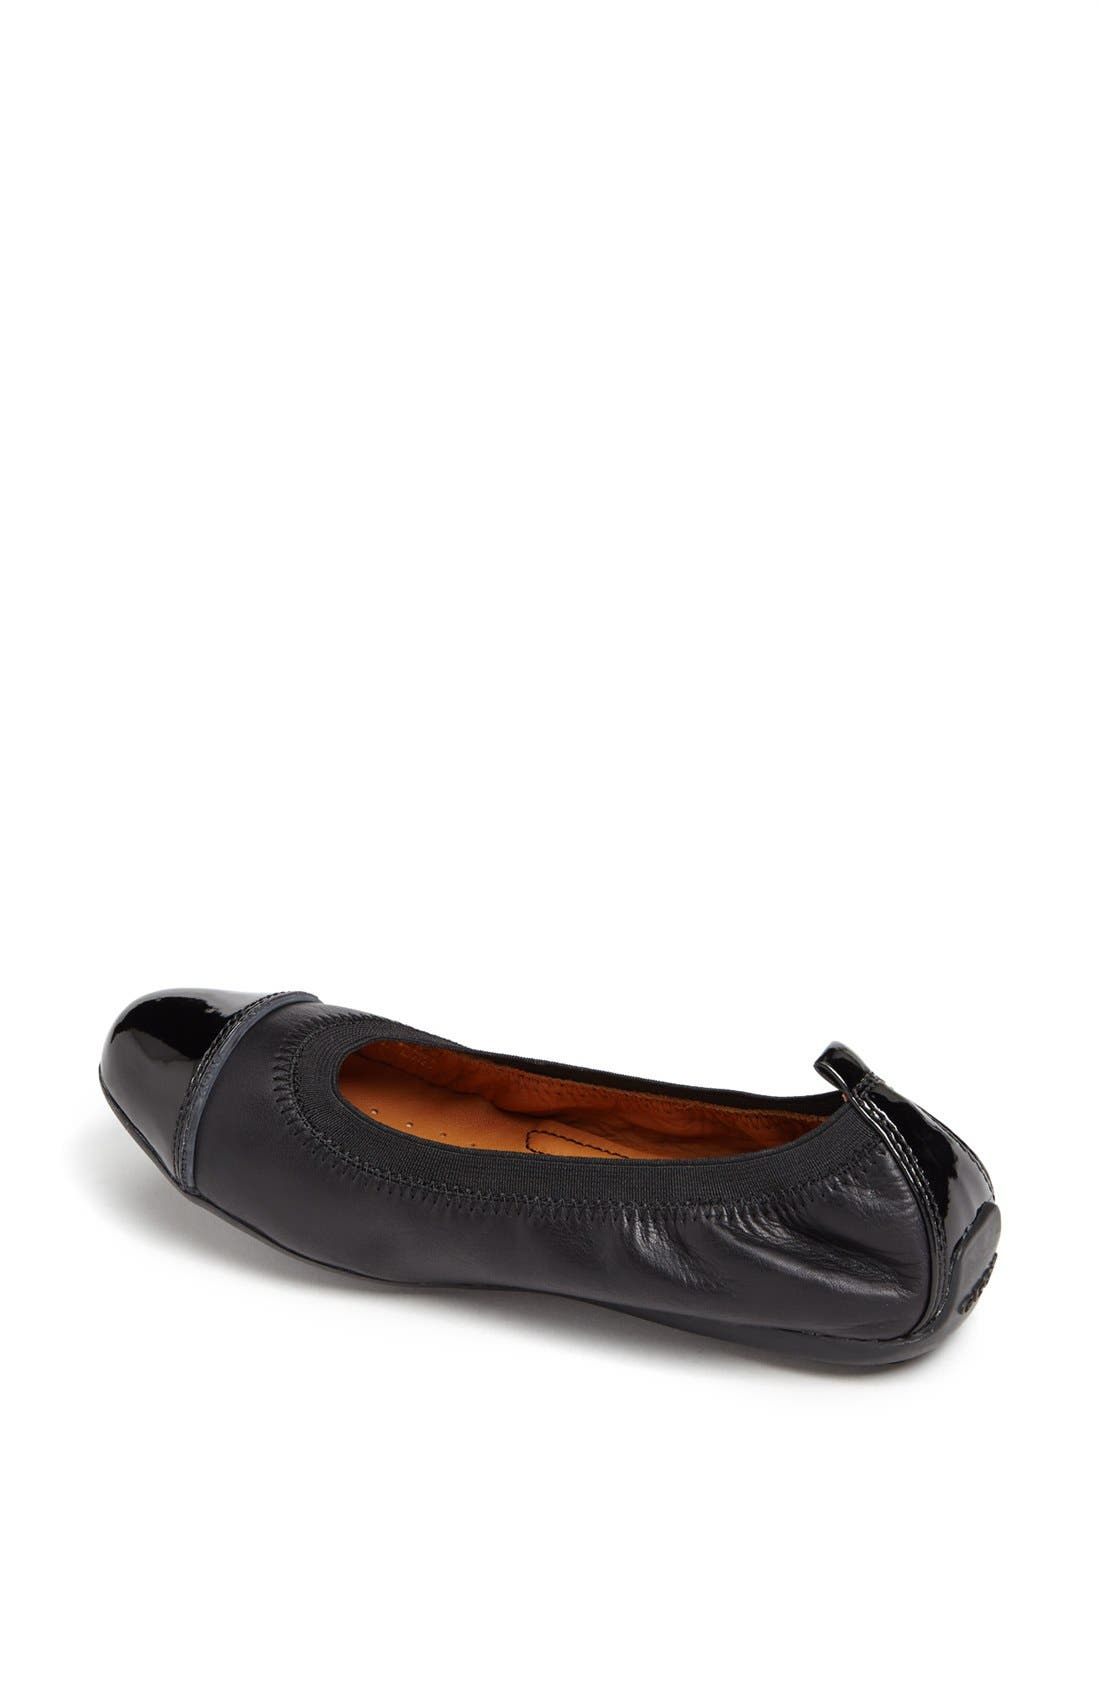 Alternate Image 2  - Geox 'Piuma' Cap Toe Ballerina Flat